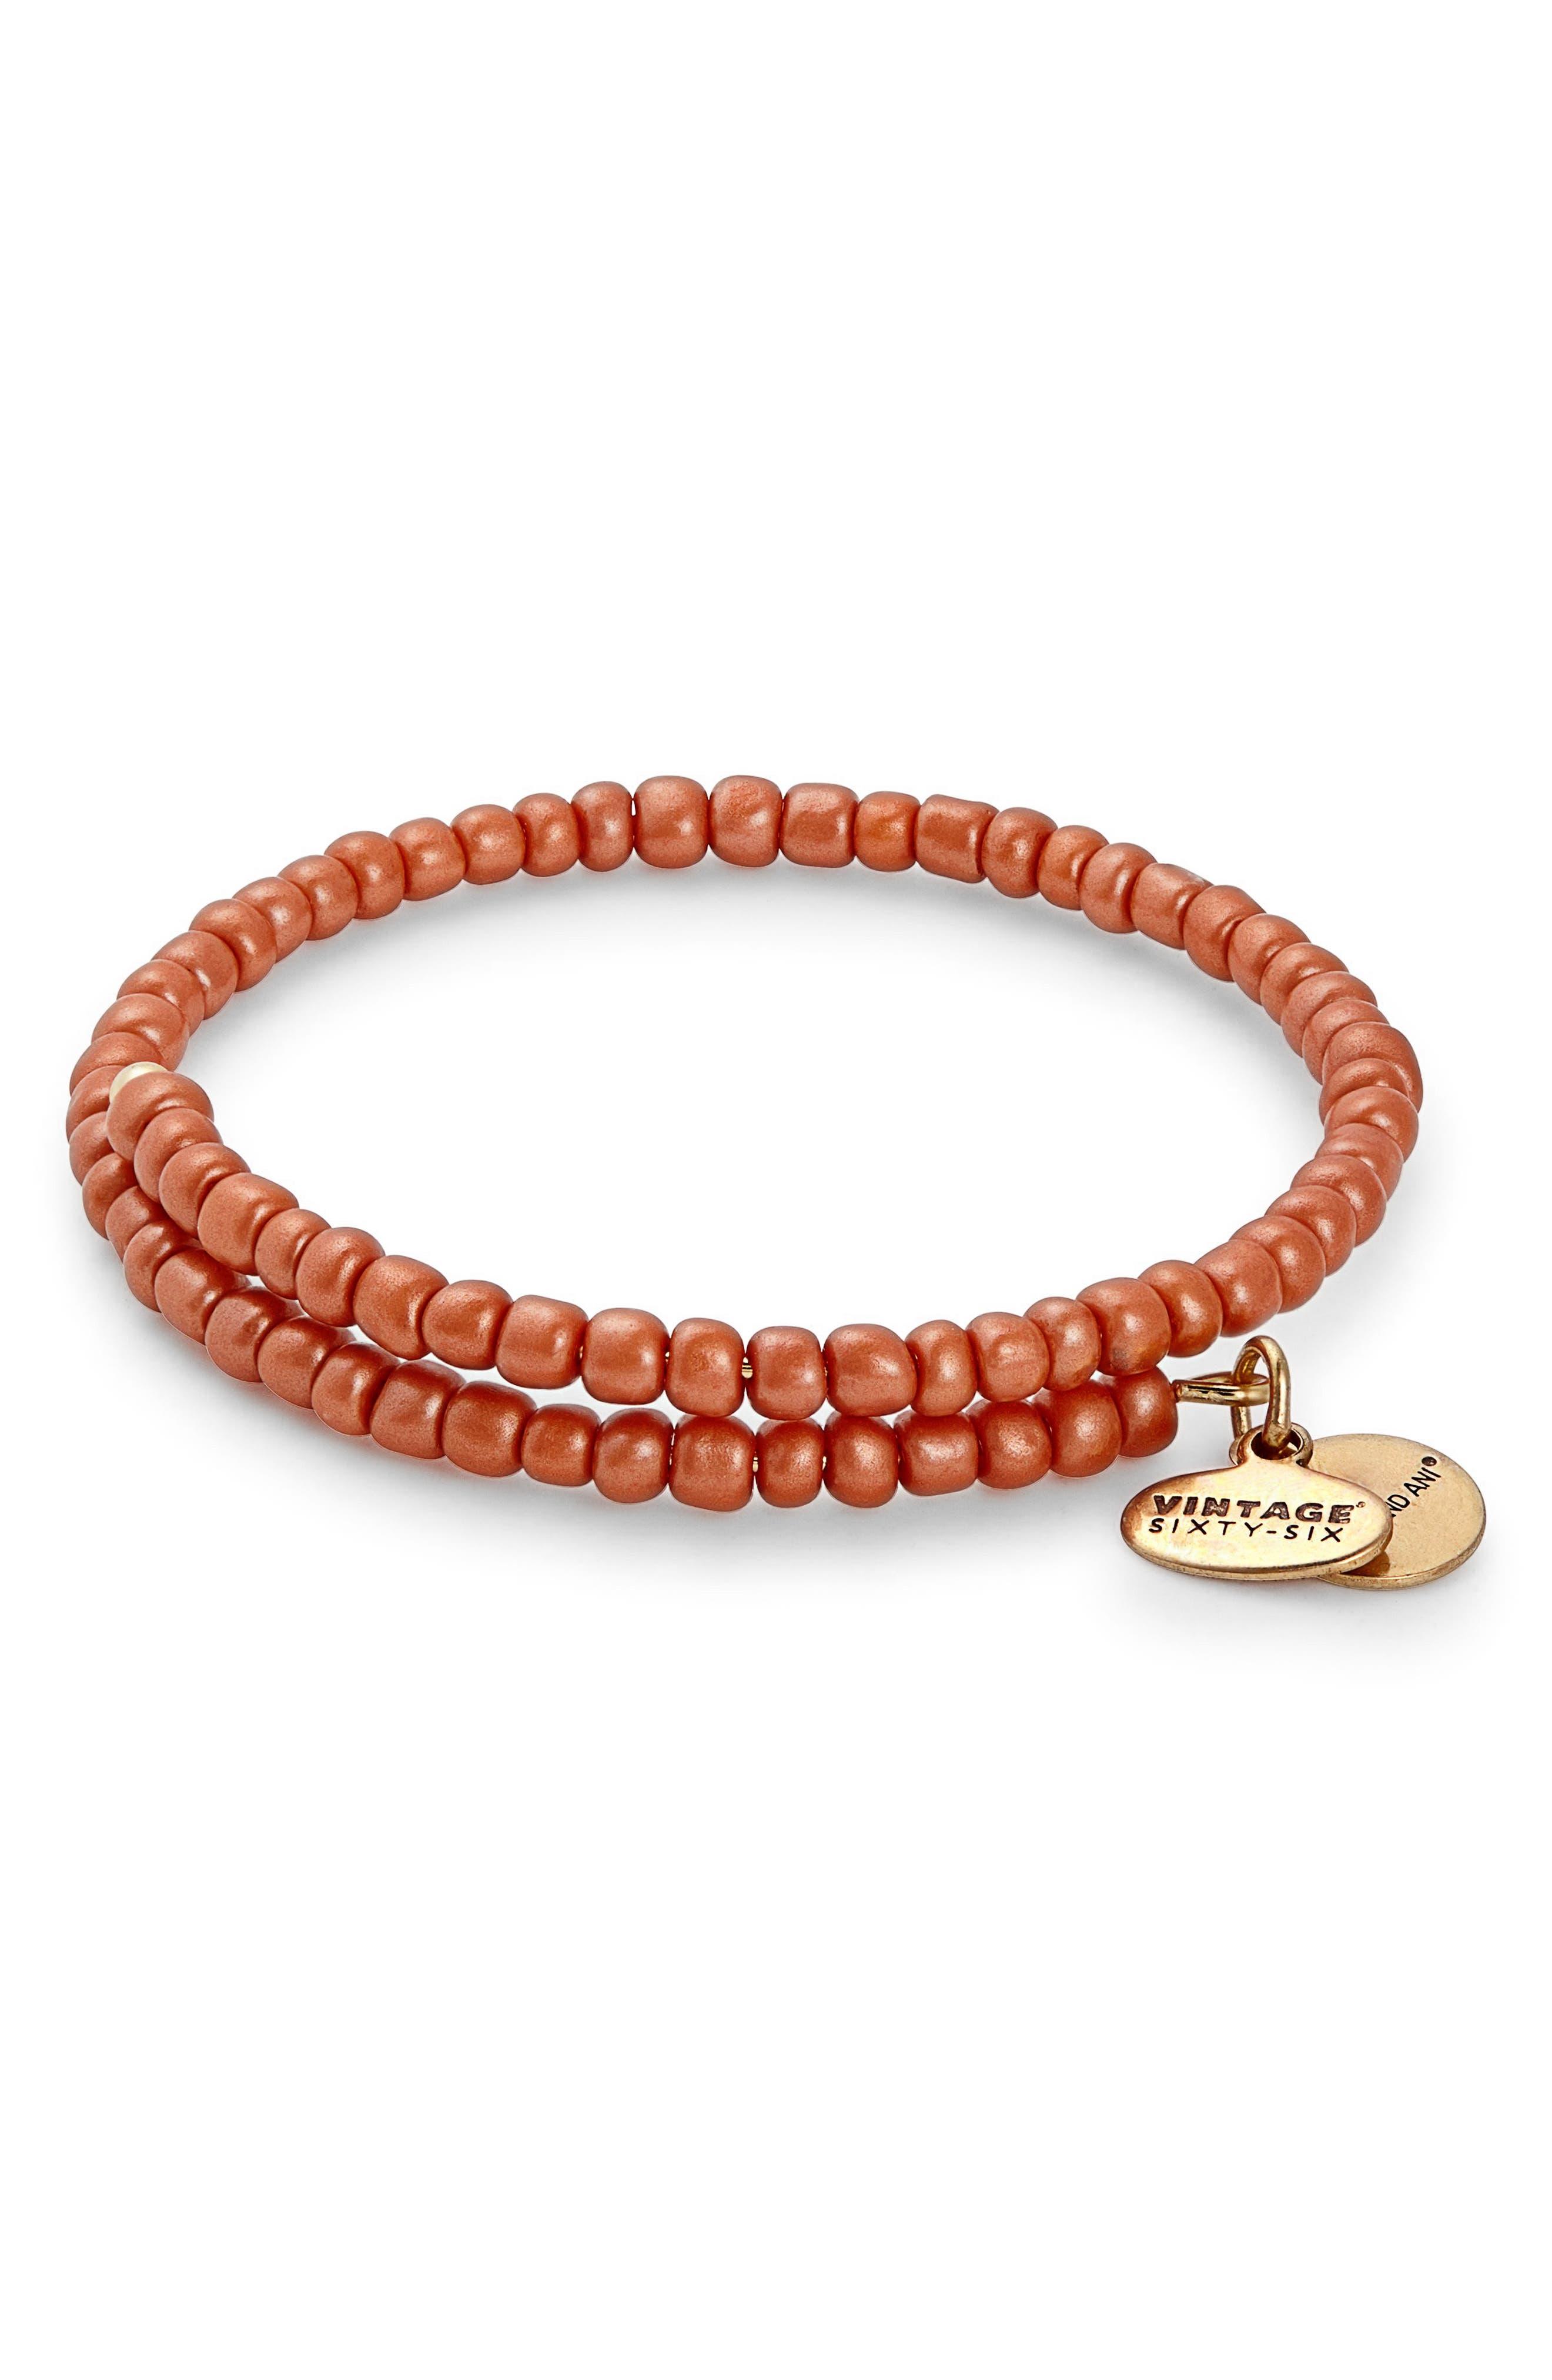 Primal Spirit Wrap Bracelet,                         Main,                         color, Orange/ Gold